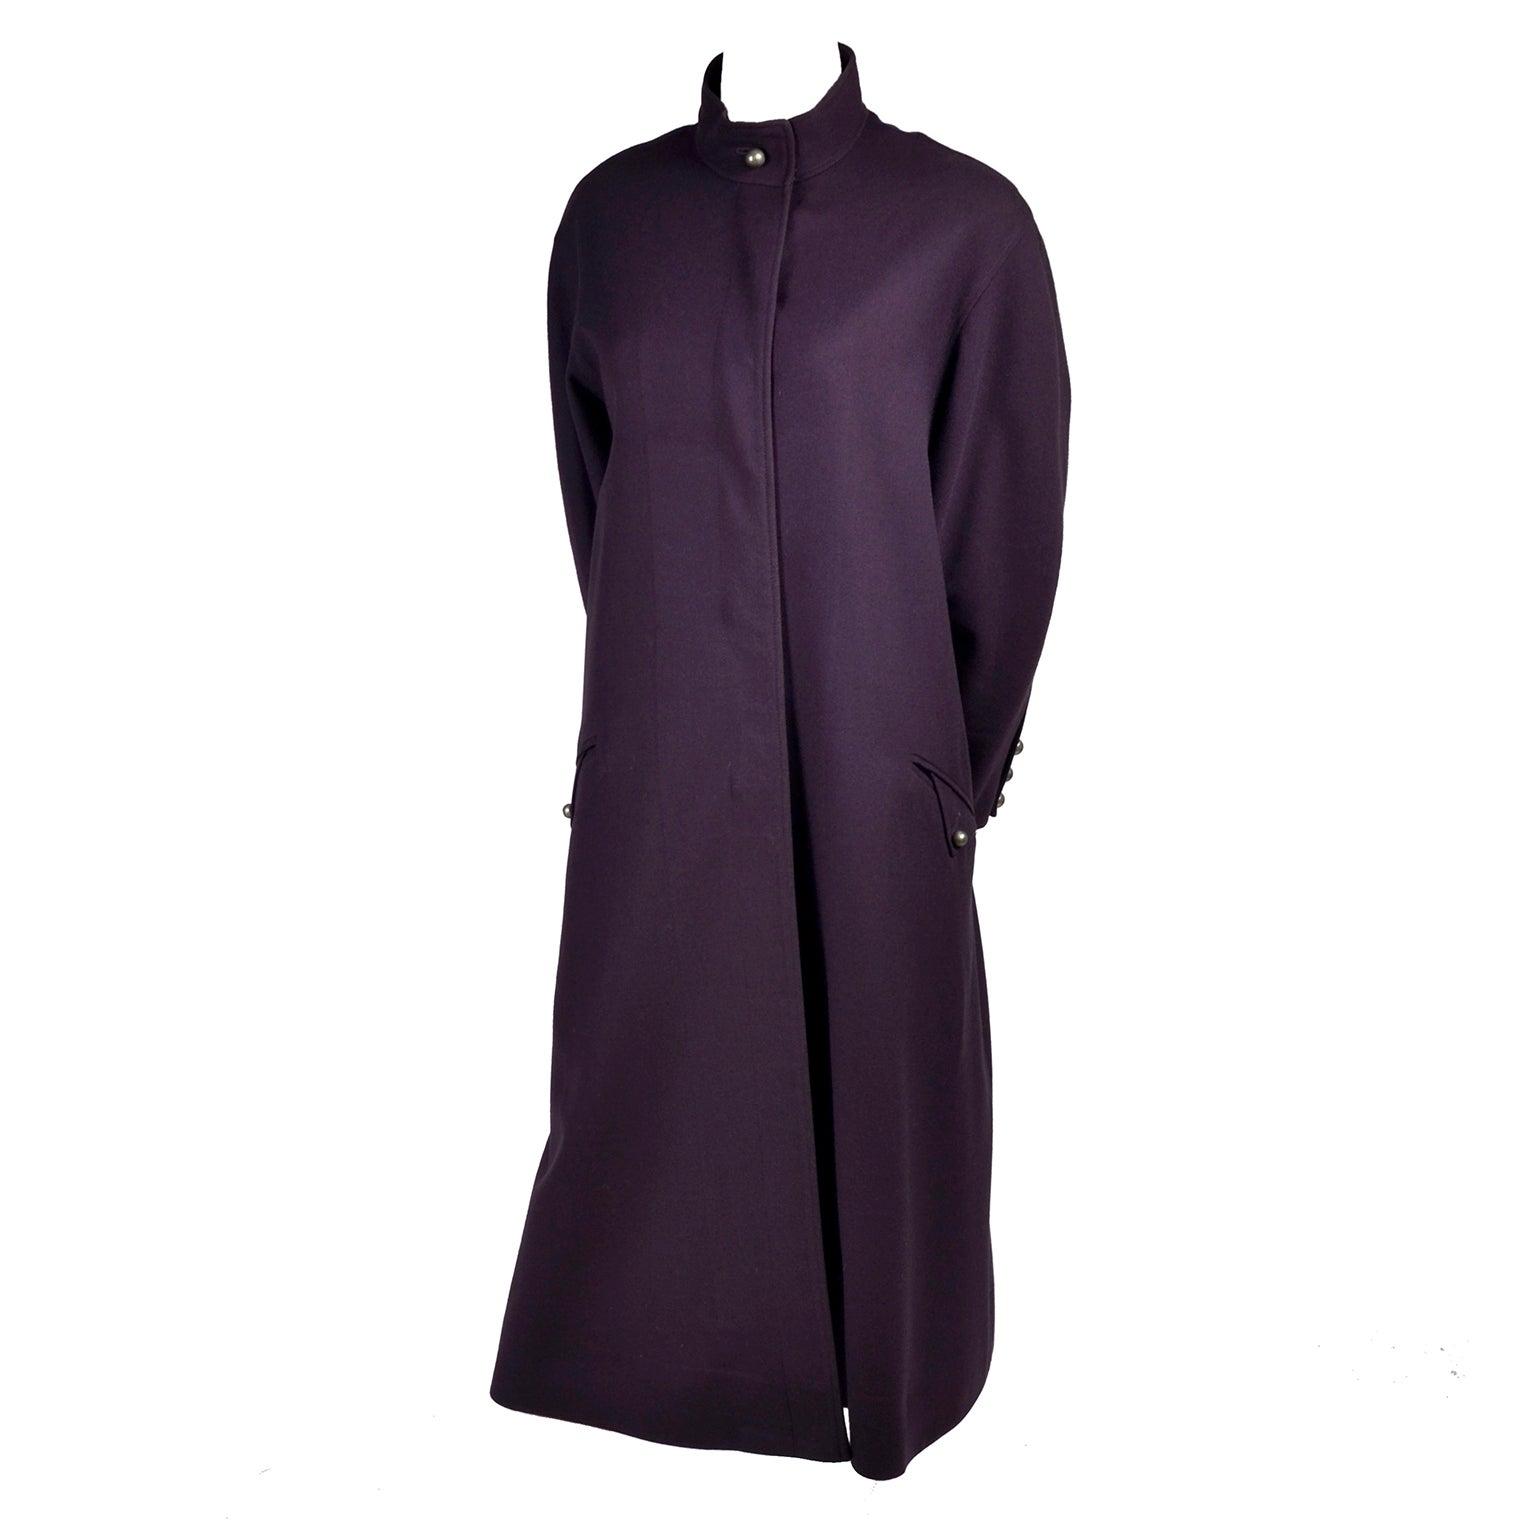 1980s Louis Feraud Purple Wool Vintage Coat With Pockets Size 34